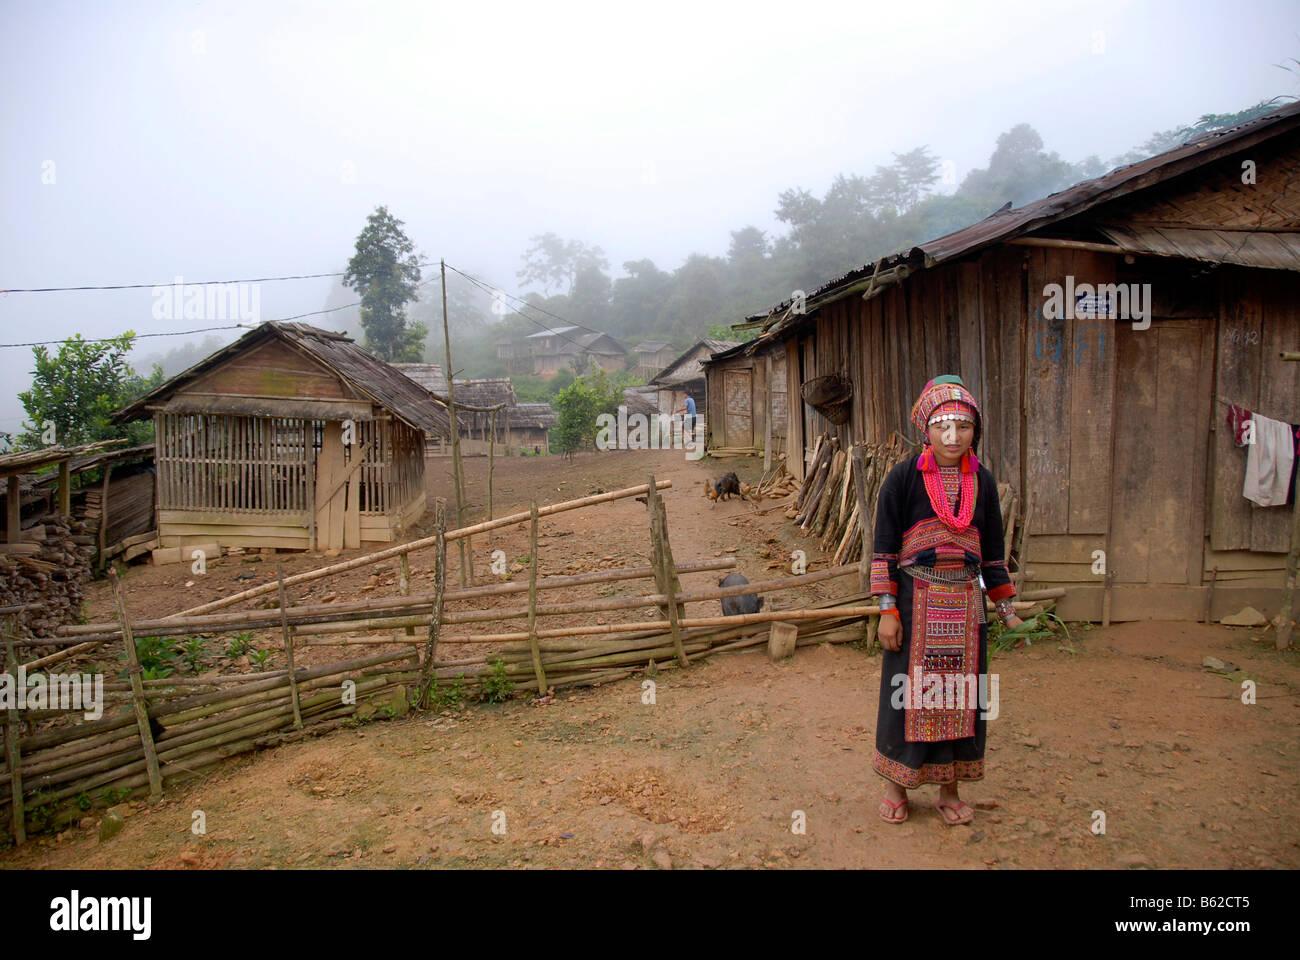 Junge Frau des Stammes Akha Pala tragen bunte Tracht stehen im Dorf Ban Saenkham Tai, Phongsali P Stockbild